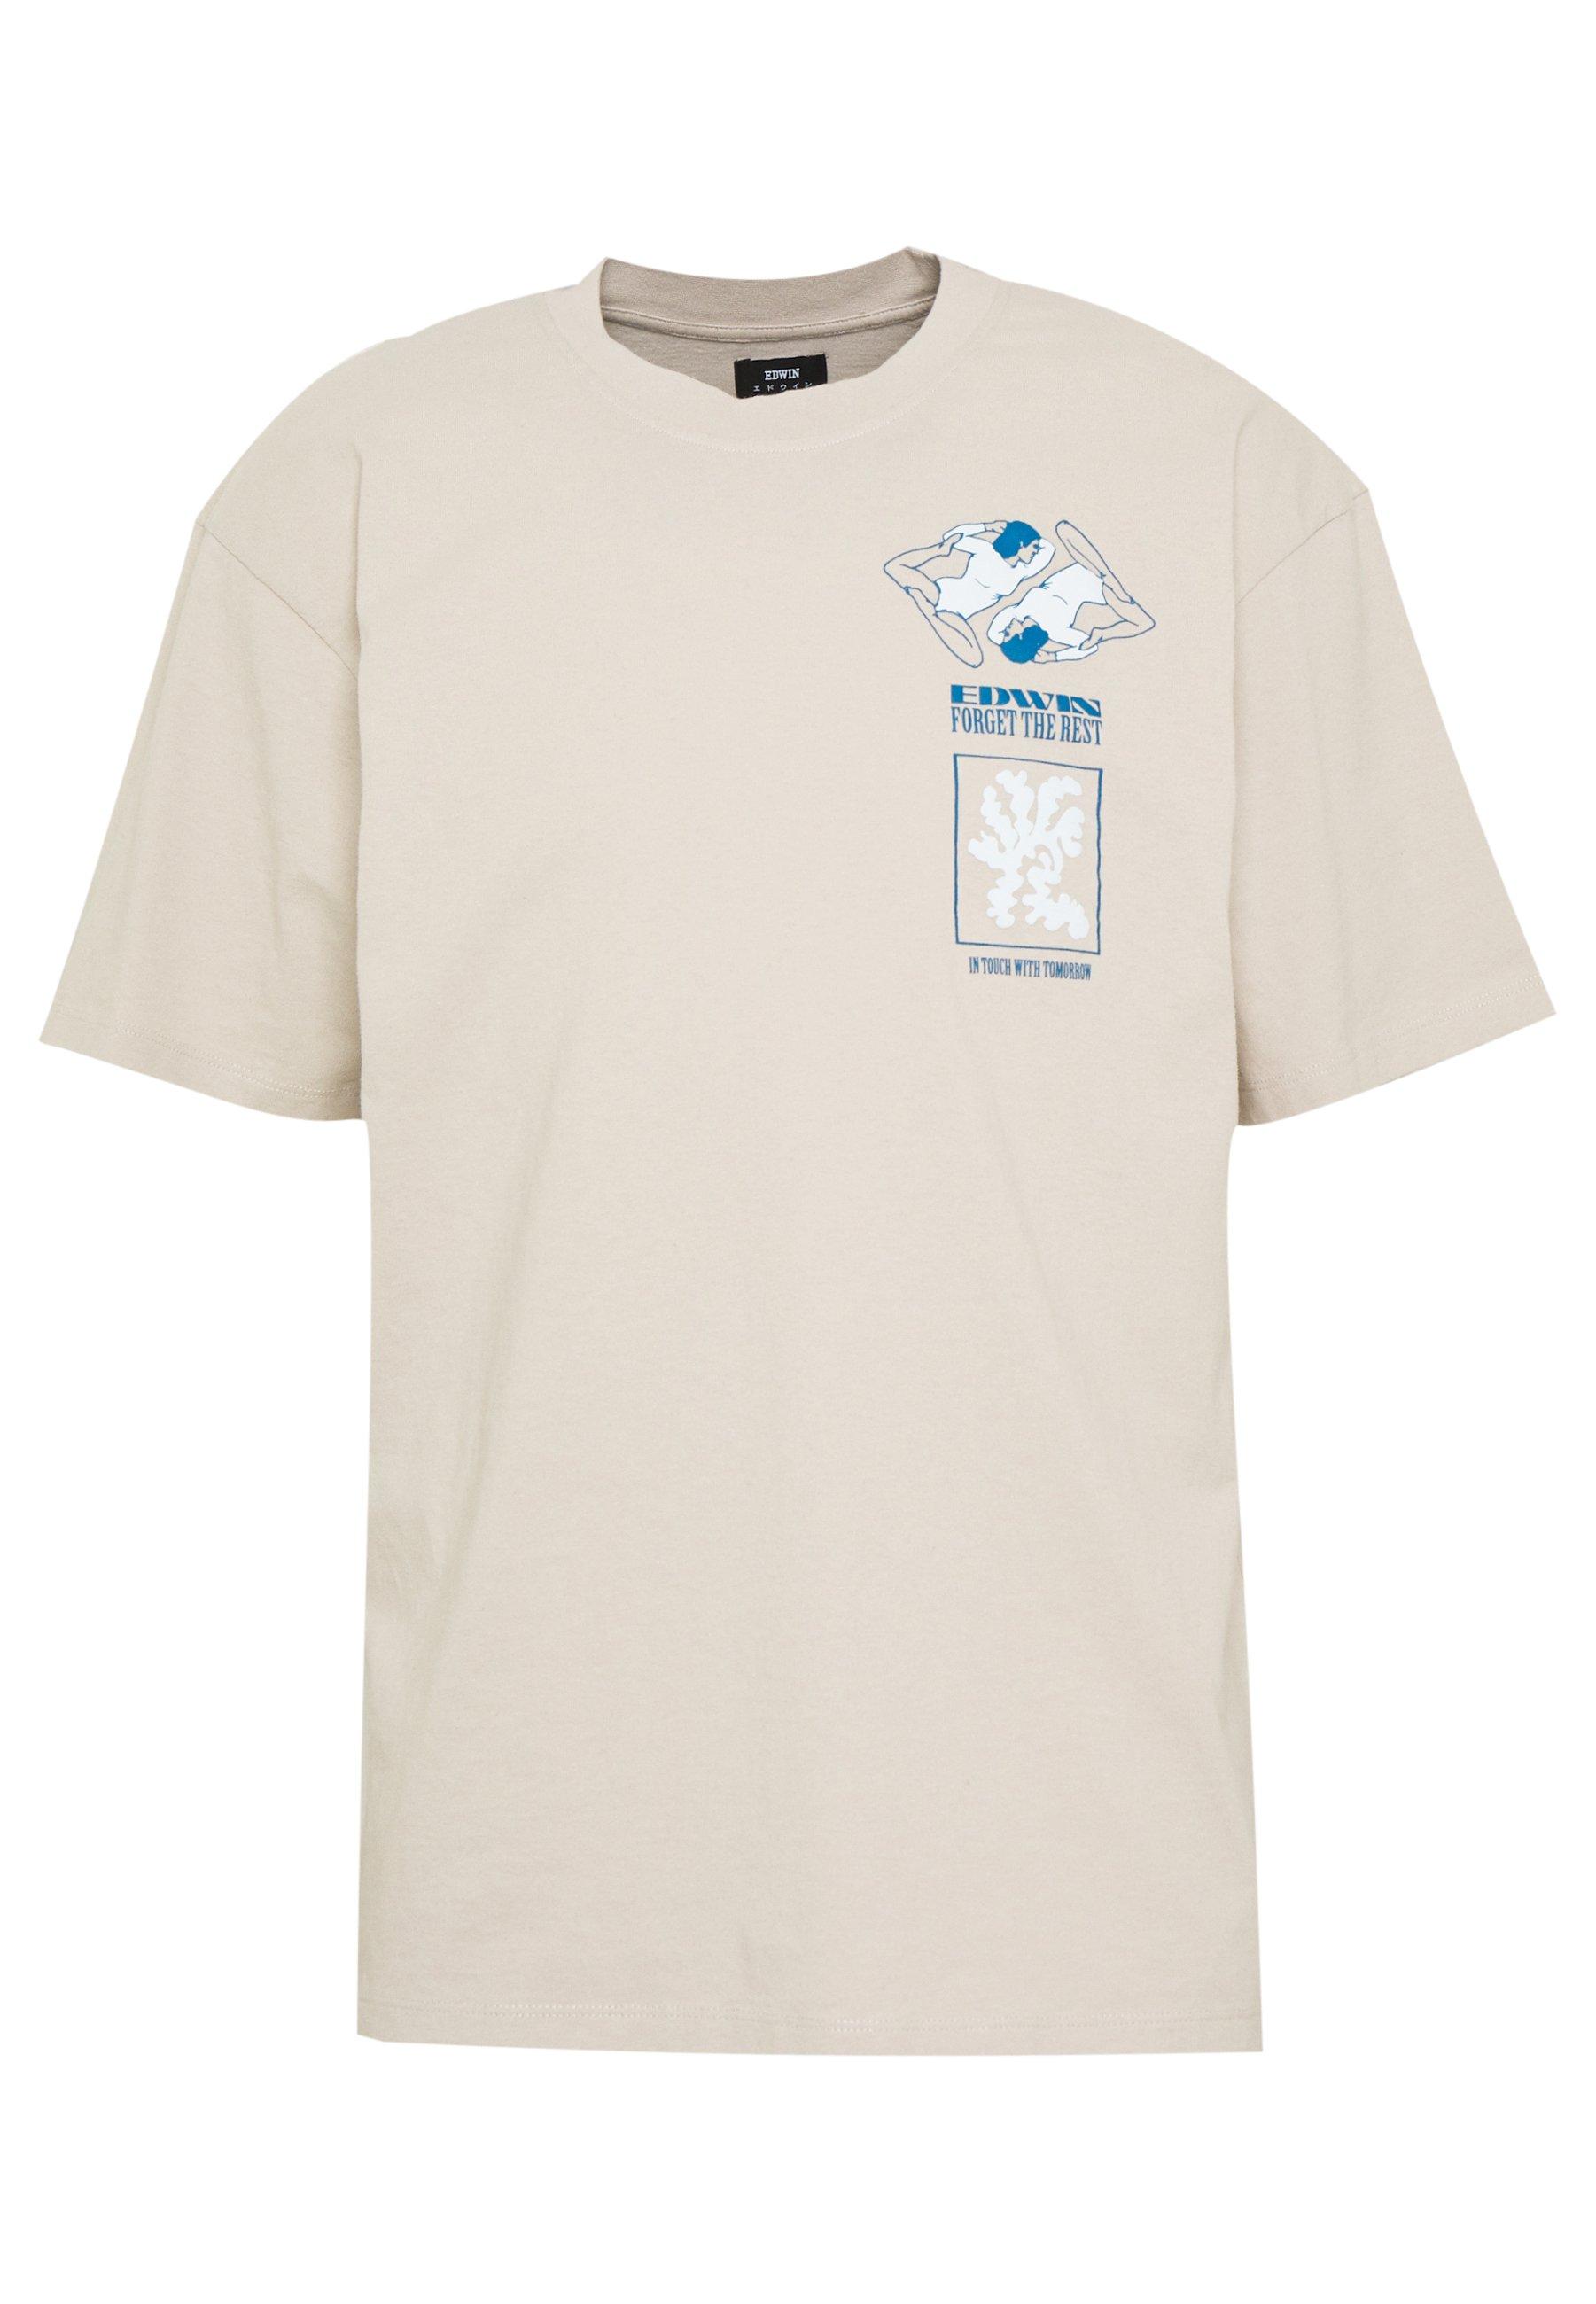 Edwin Self Examination - T-shirt Con Stampa Silver Cloud QXHKo0f